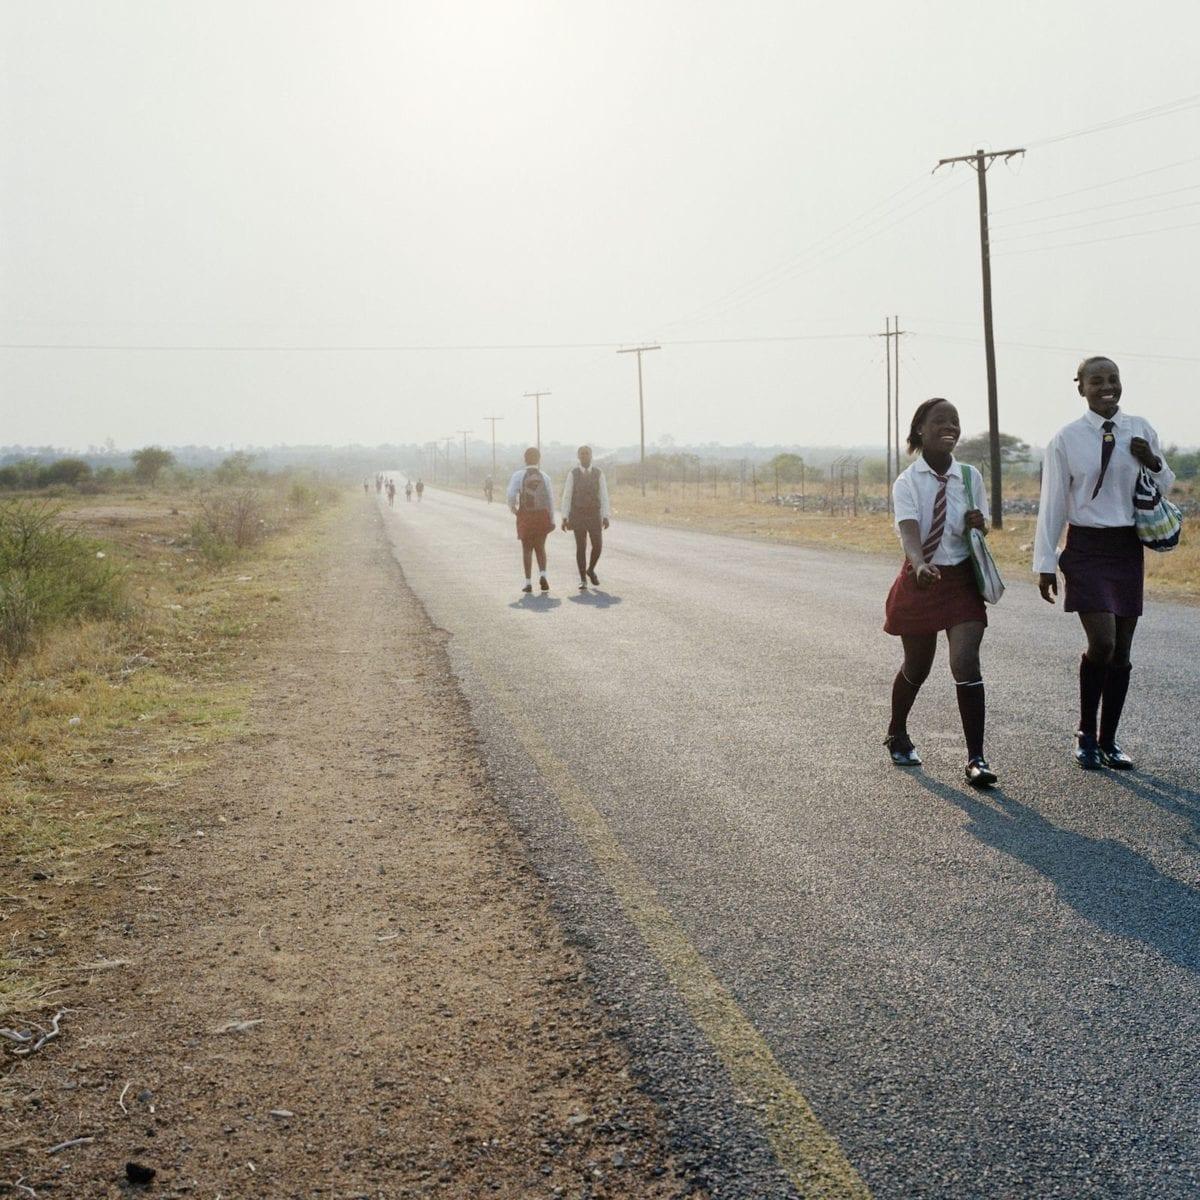 Homeland, Road Divide Guateng and Northwest Province, Hamaskraal, Former Bophuthatswana, 2011